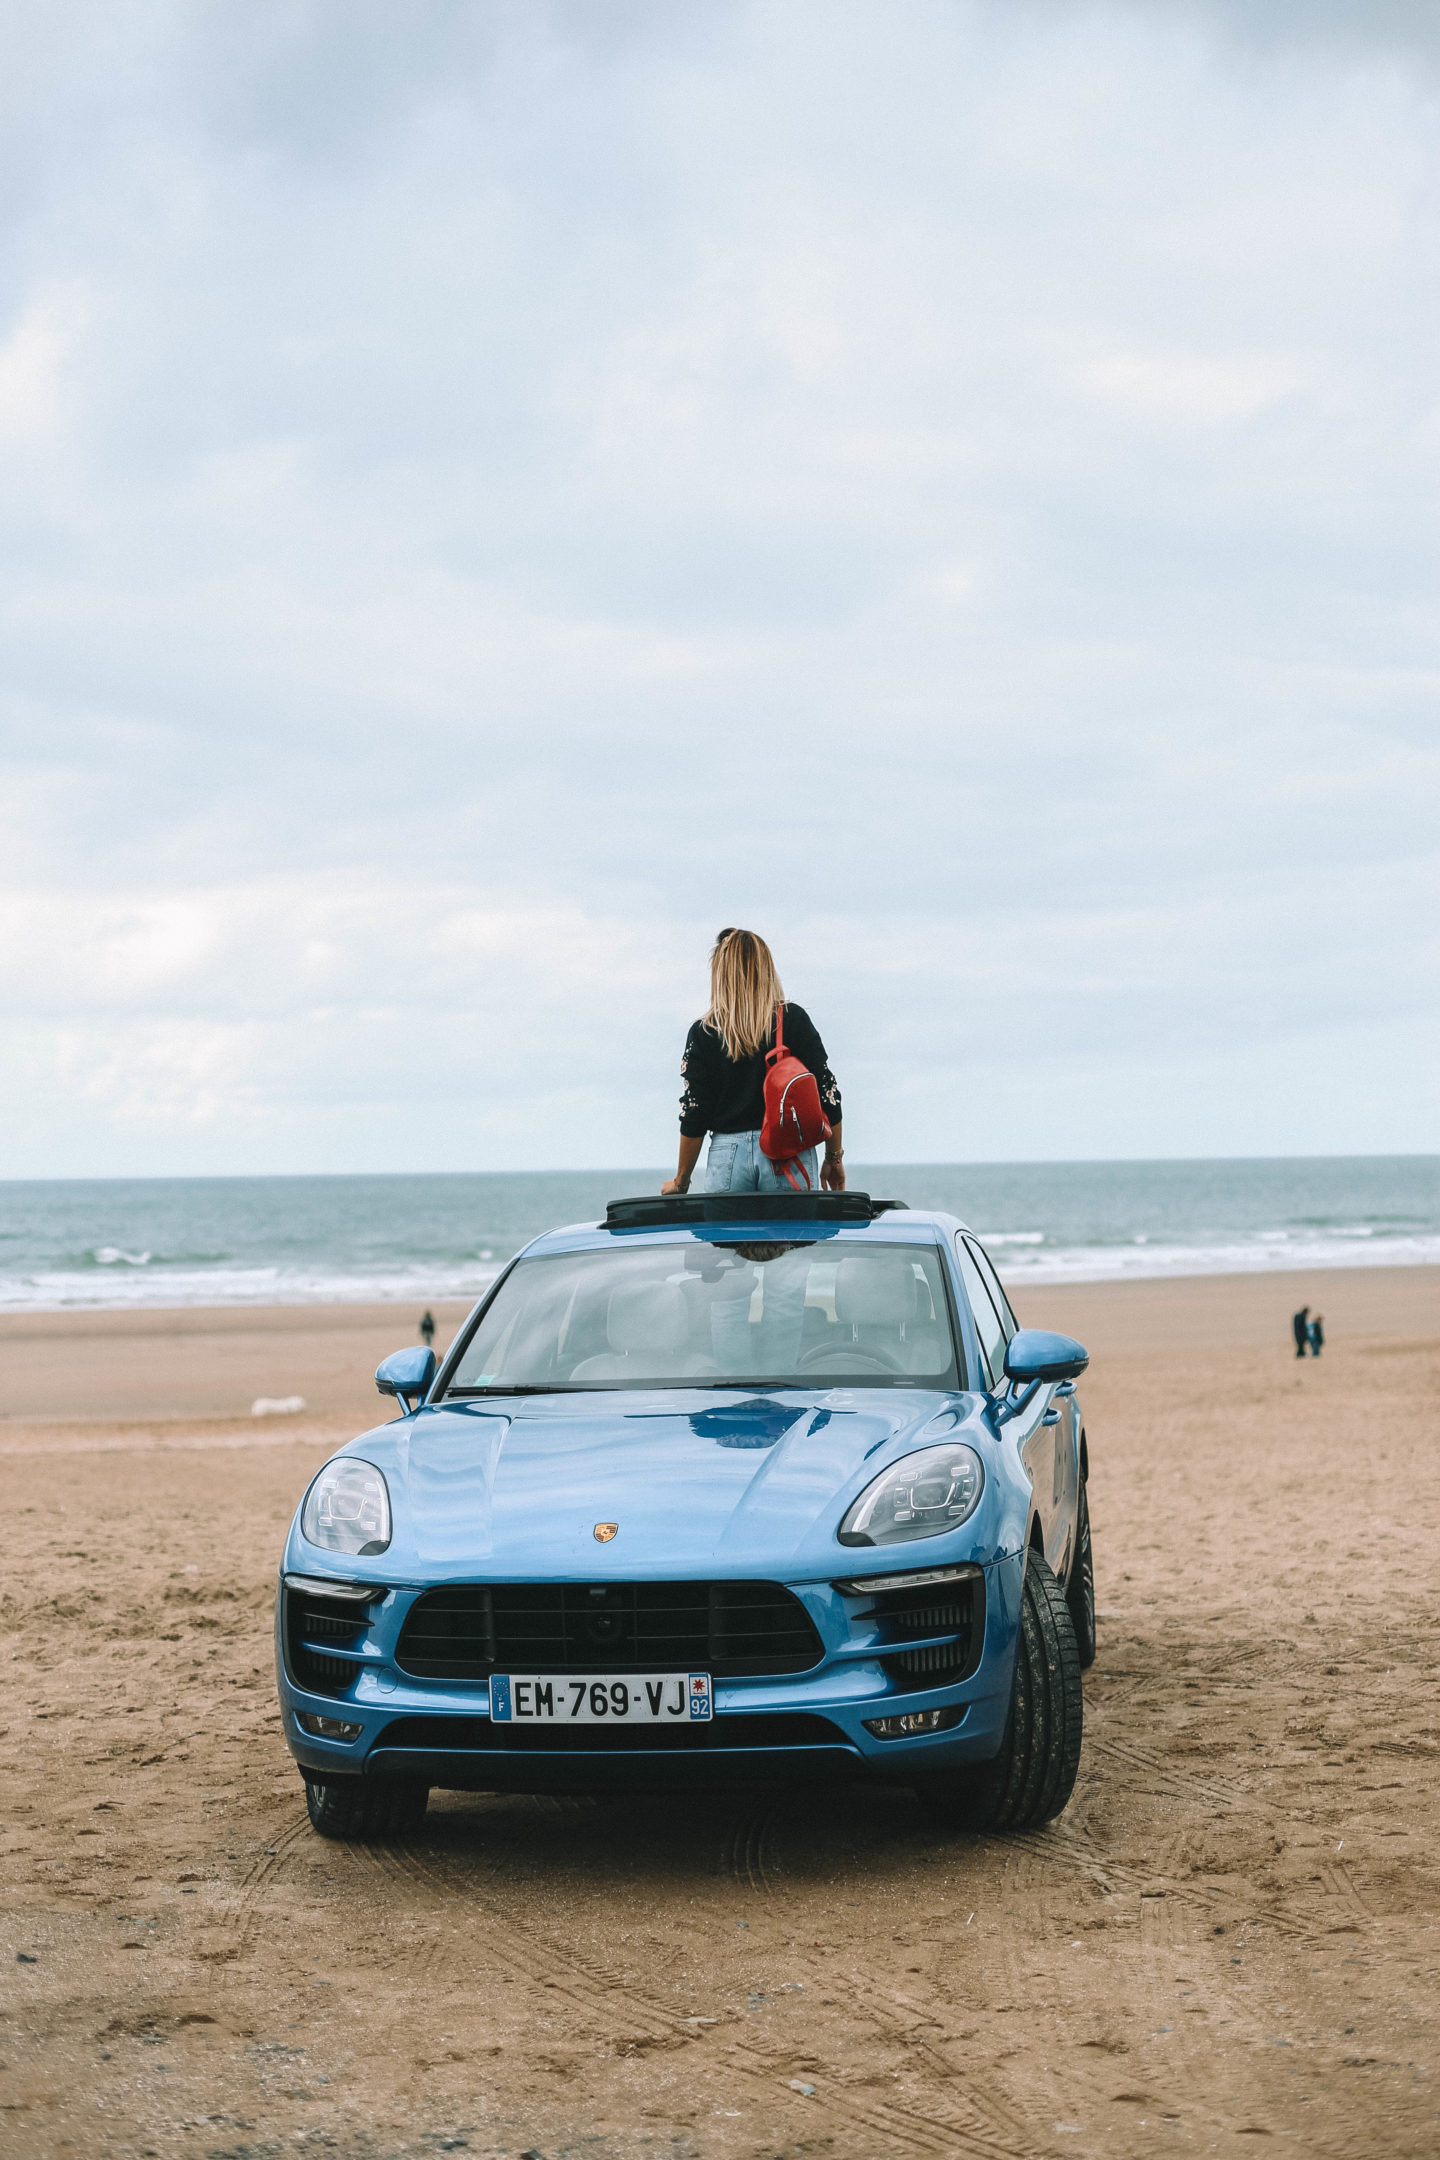 Visiter Deauville - Blondie Baby blog mode et voyages